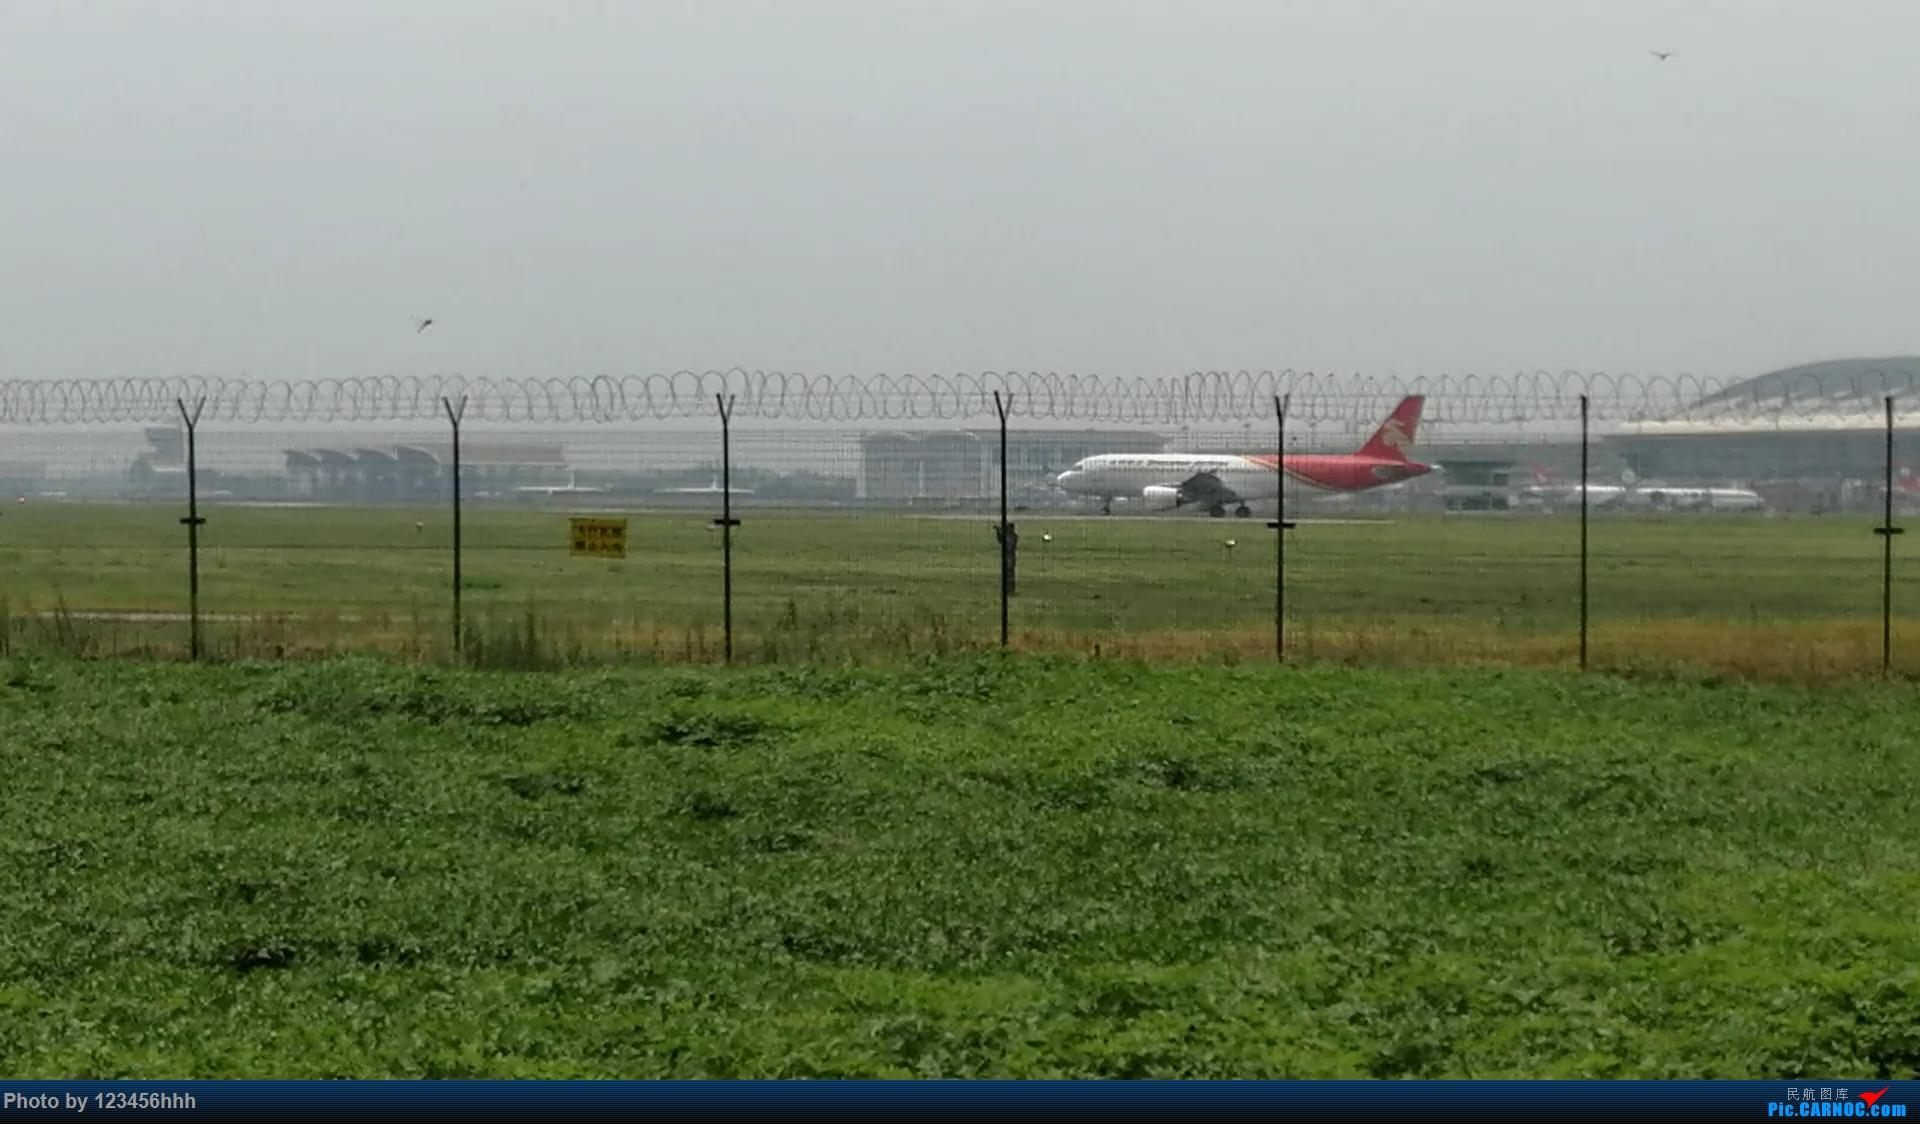 Re:[原创]苏南硕放国际机场拍机(二) AIRBUS A320-200 B-6589 中国无锡硕放国际机场